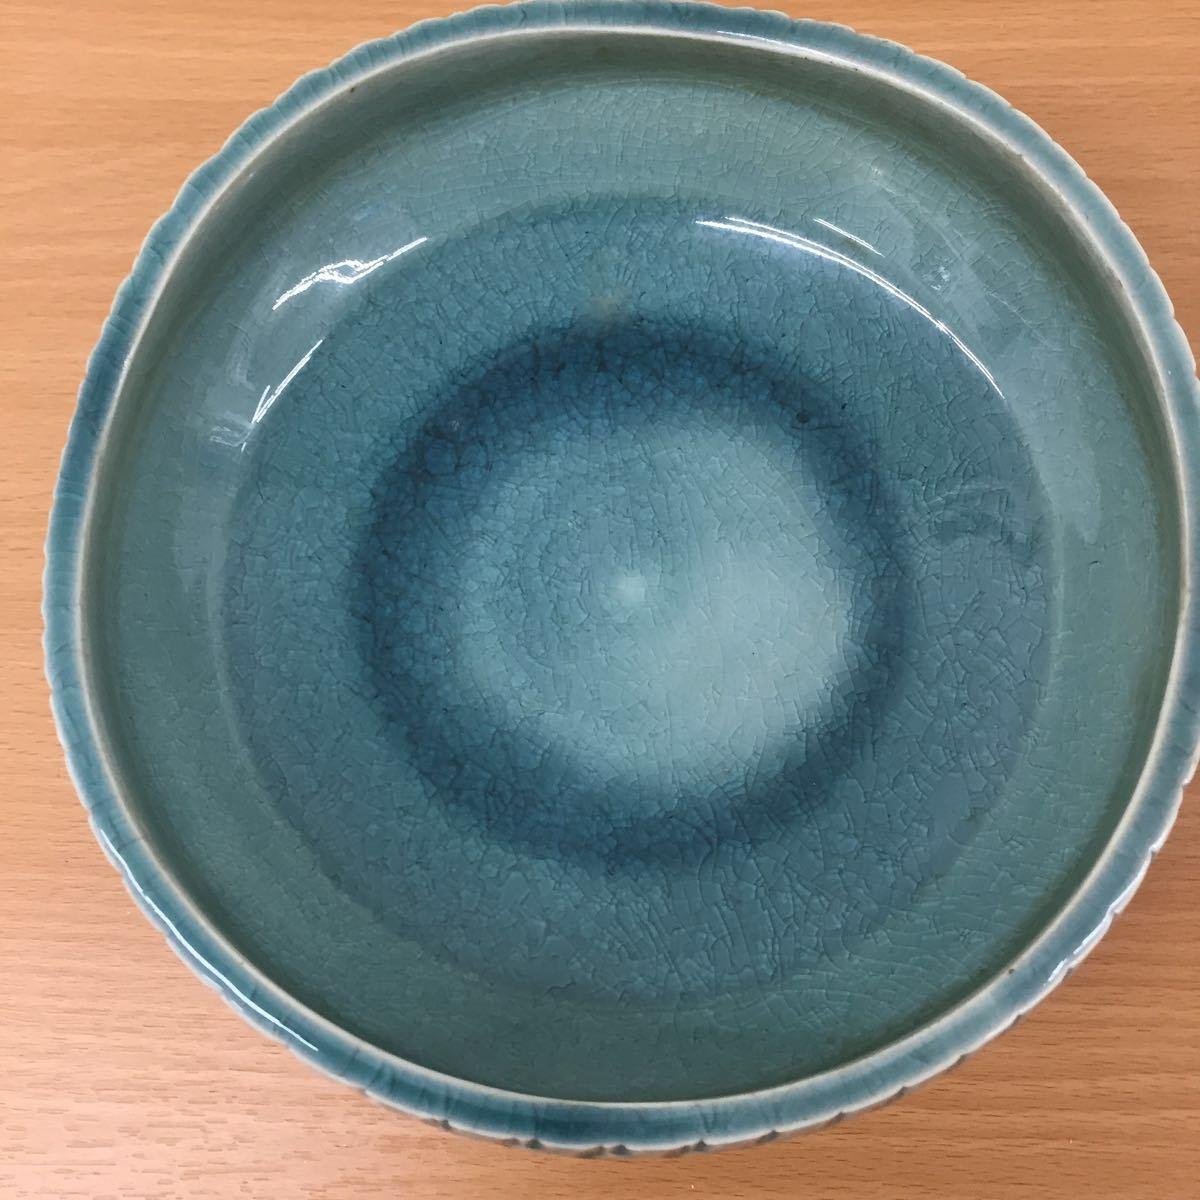 MK0227】中古品 陶器 花器 生花 盆栽_画像6